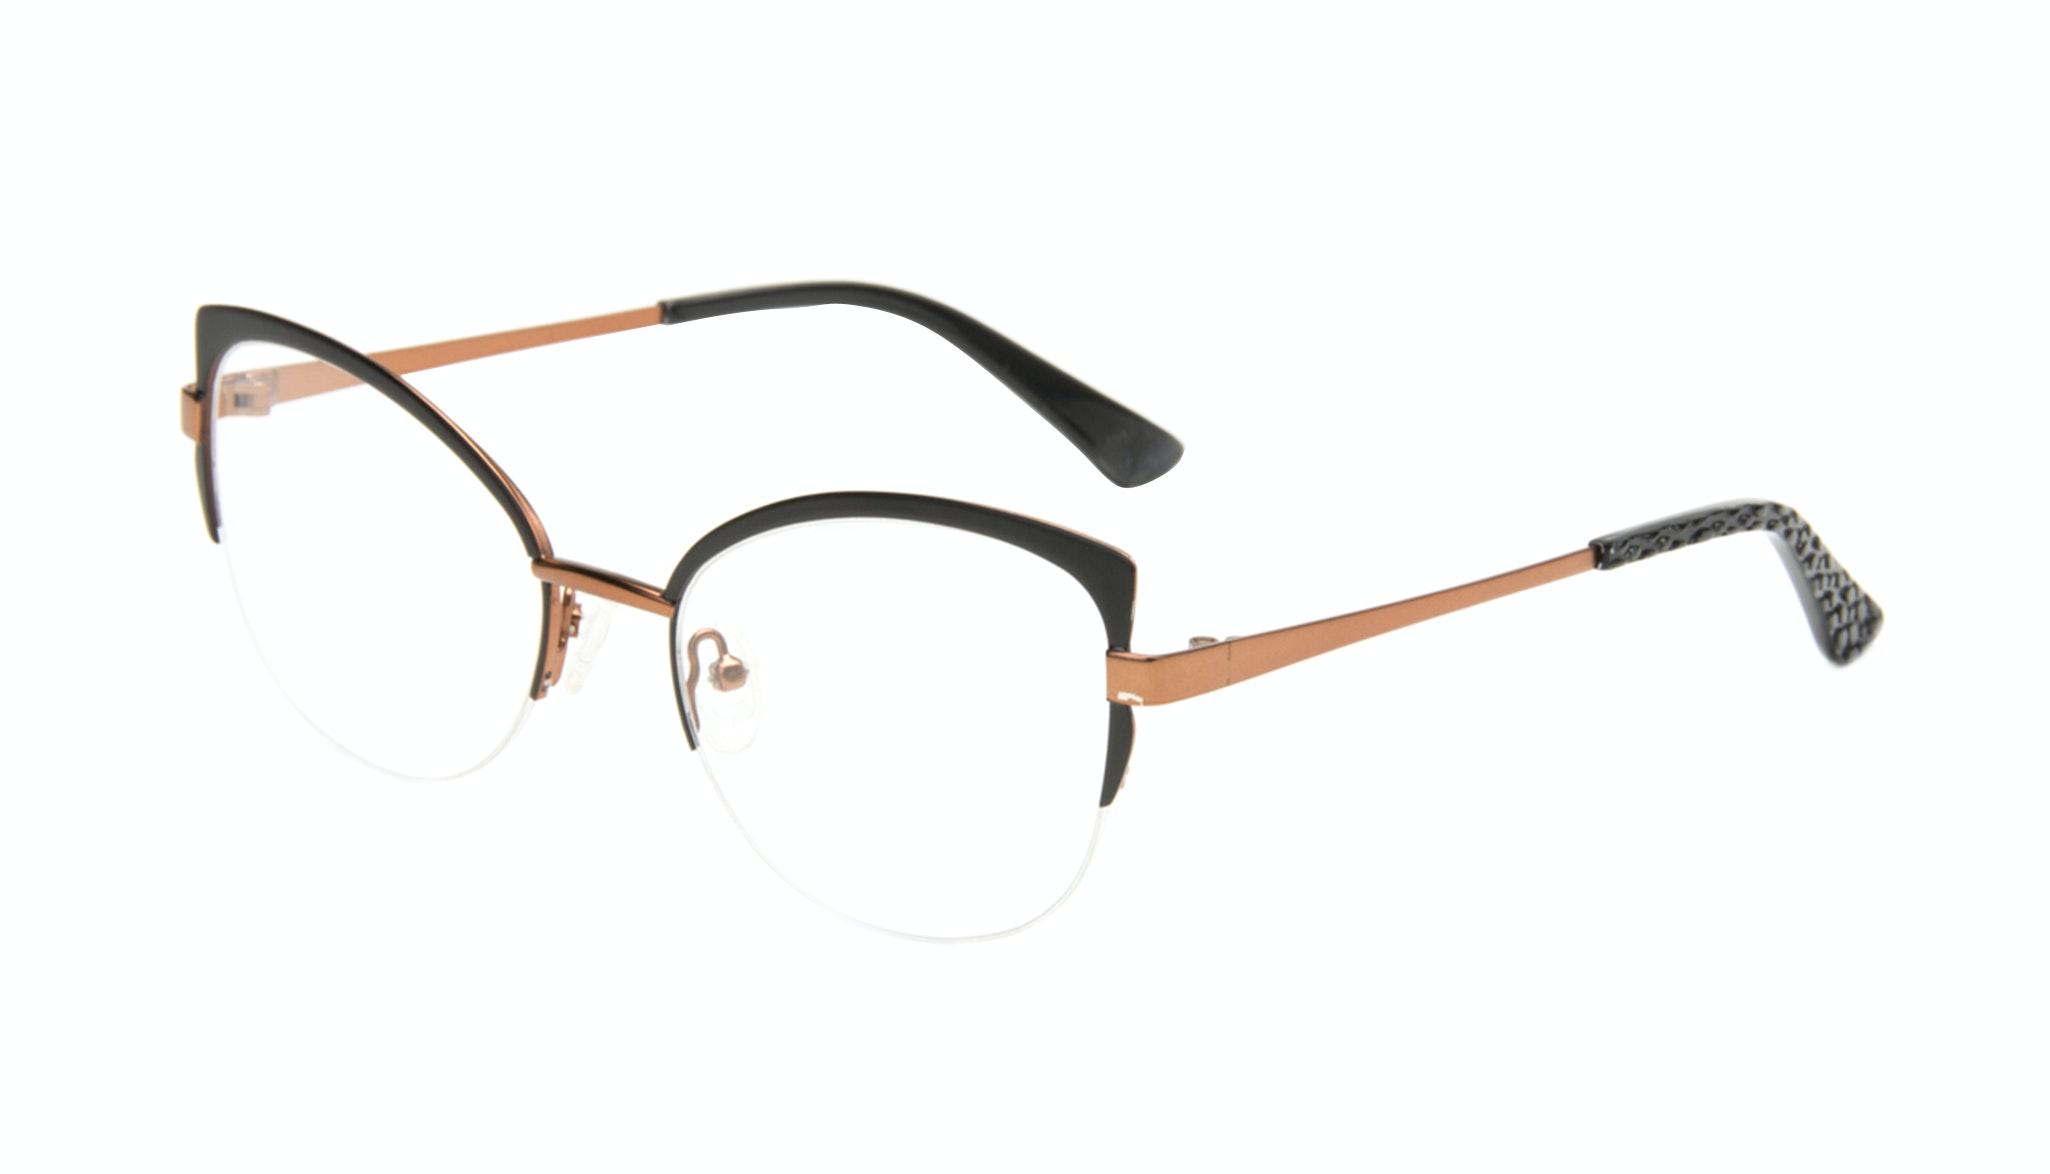 Affordable Fashion Glasses Cat Eye Semi-Rimless Eyeglasses Women Adore Black Copper Tilt